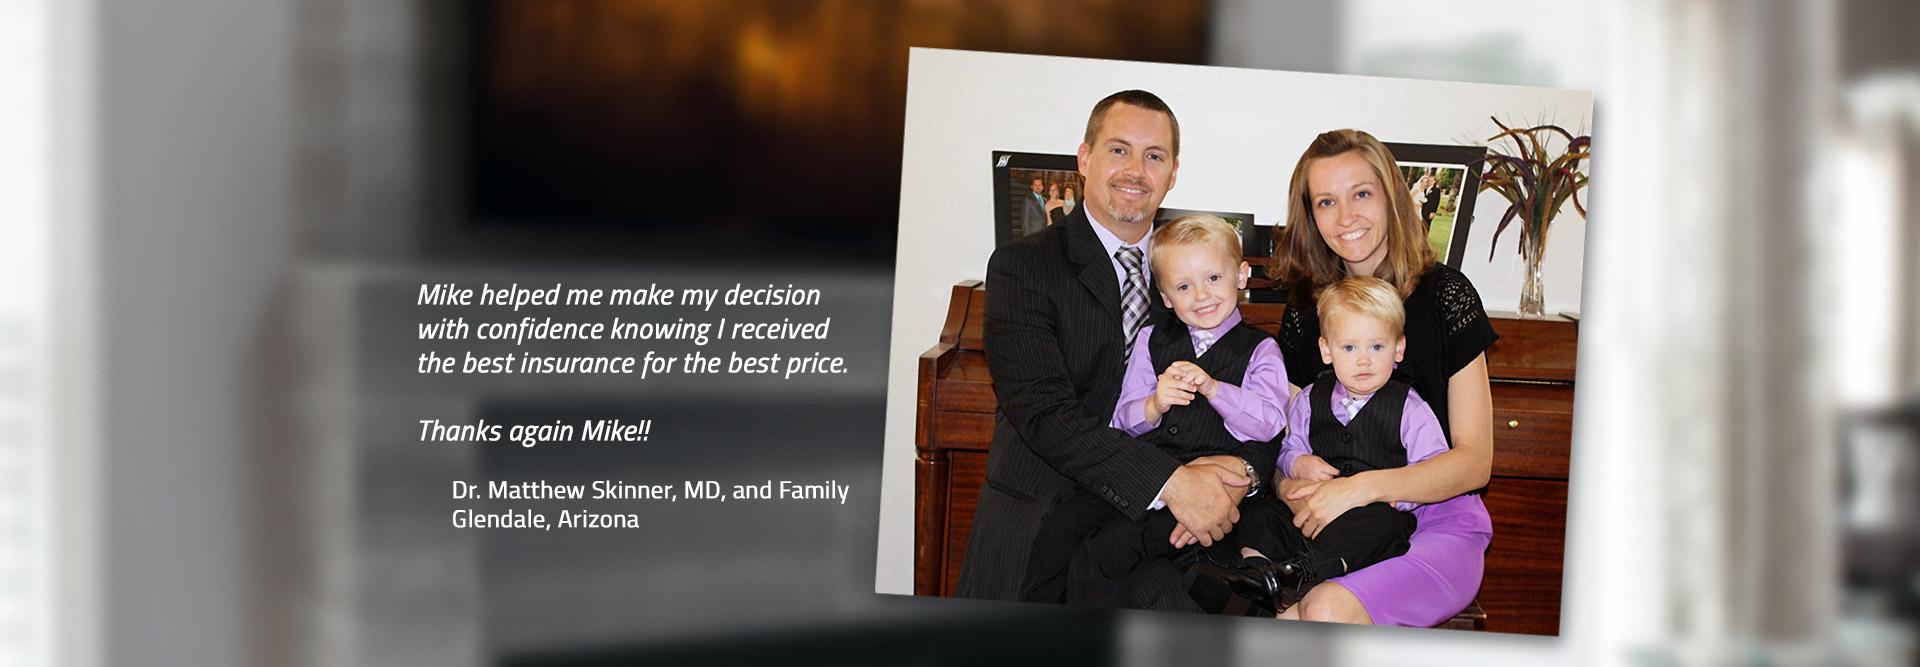 Impartial Insurance Advisor-Testimonial-004